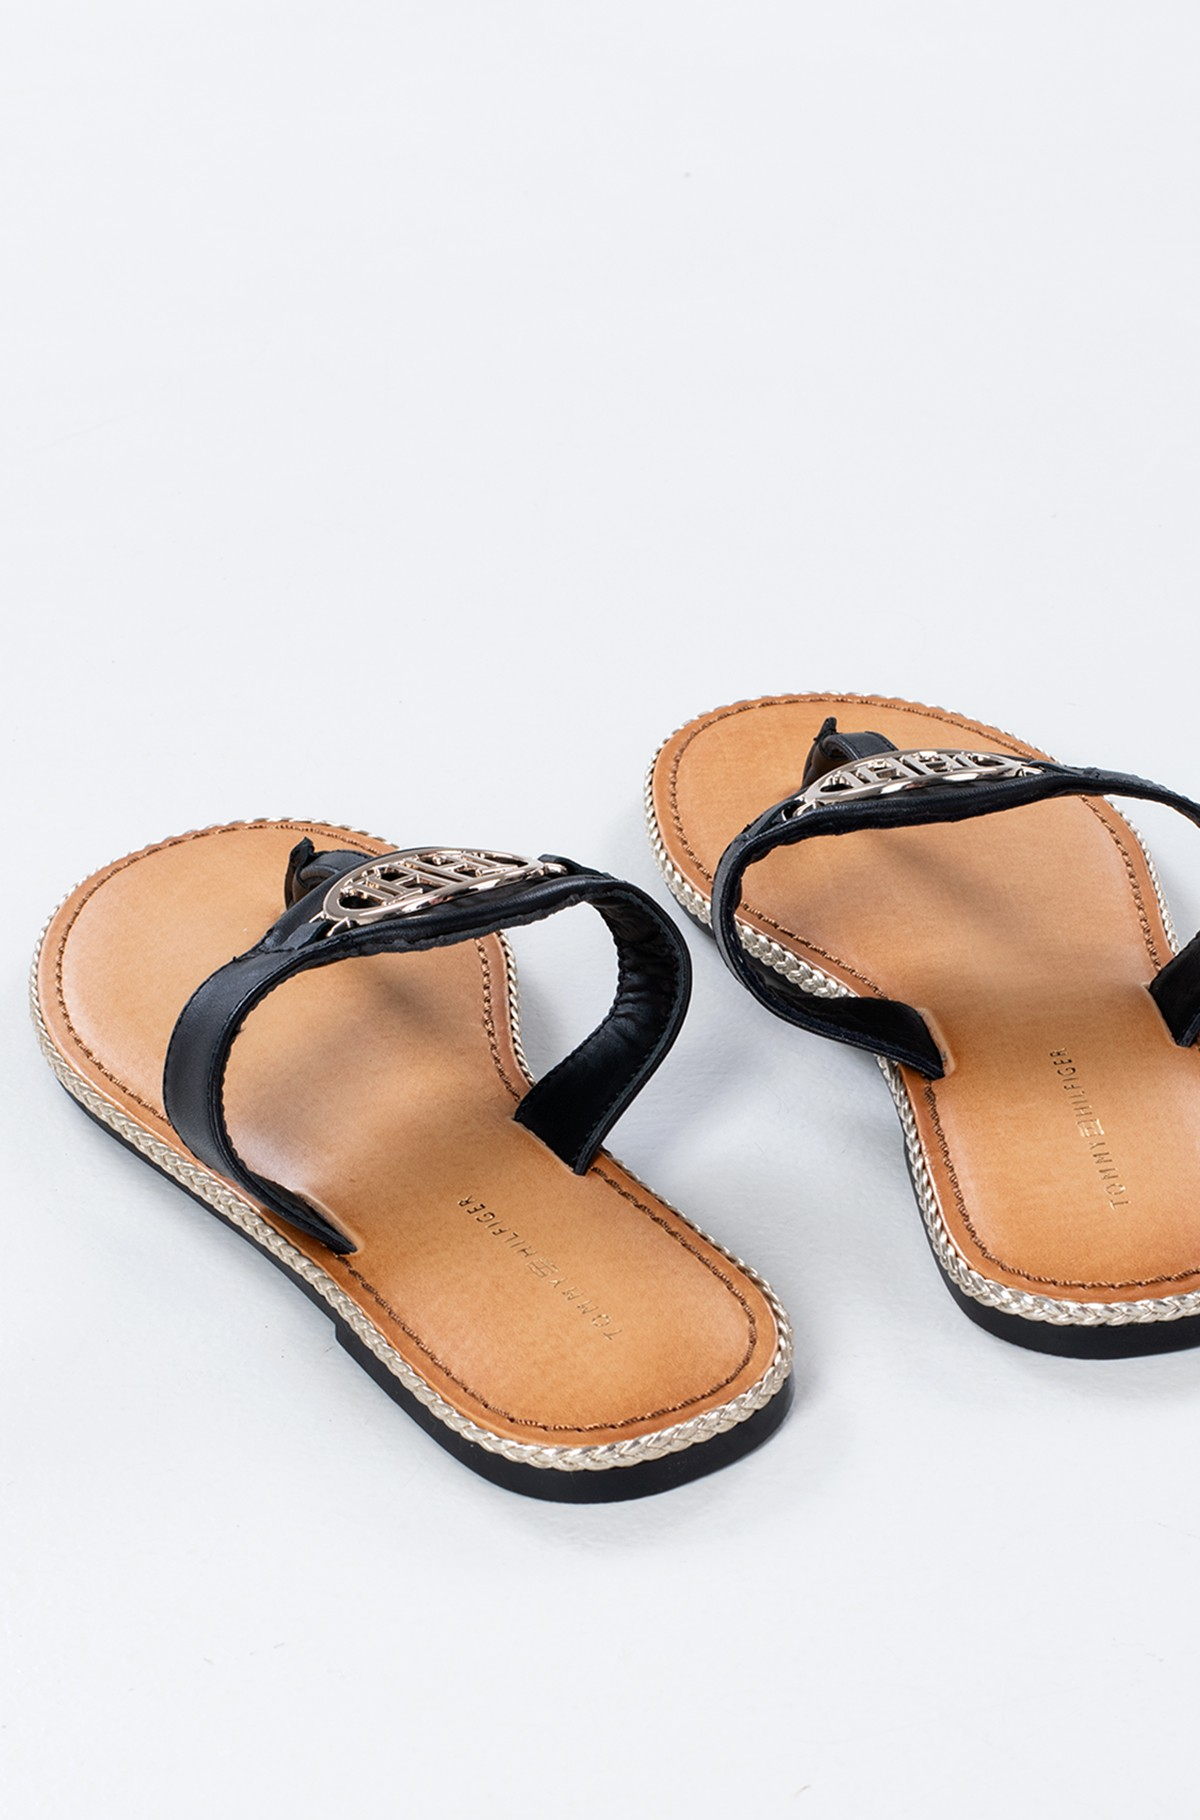 Sandals ESSENTIAL LEATHER FLAT SANDAL-full-3